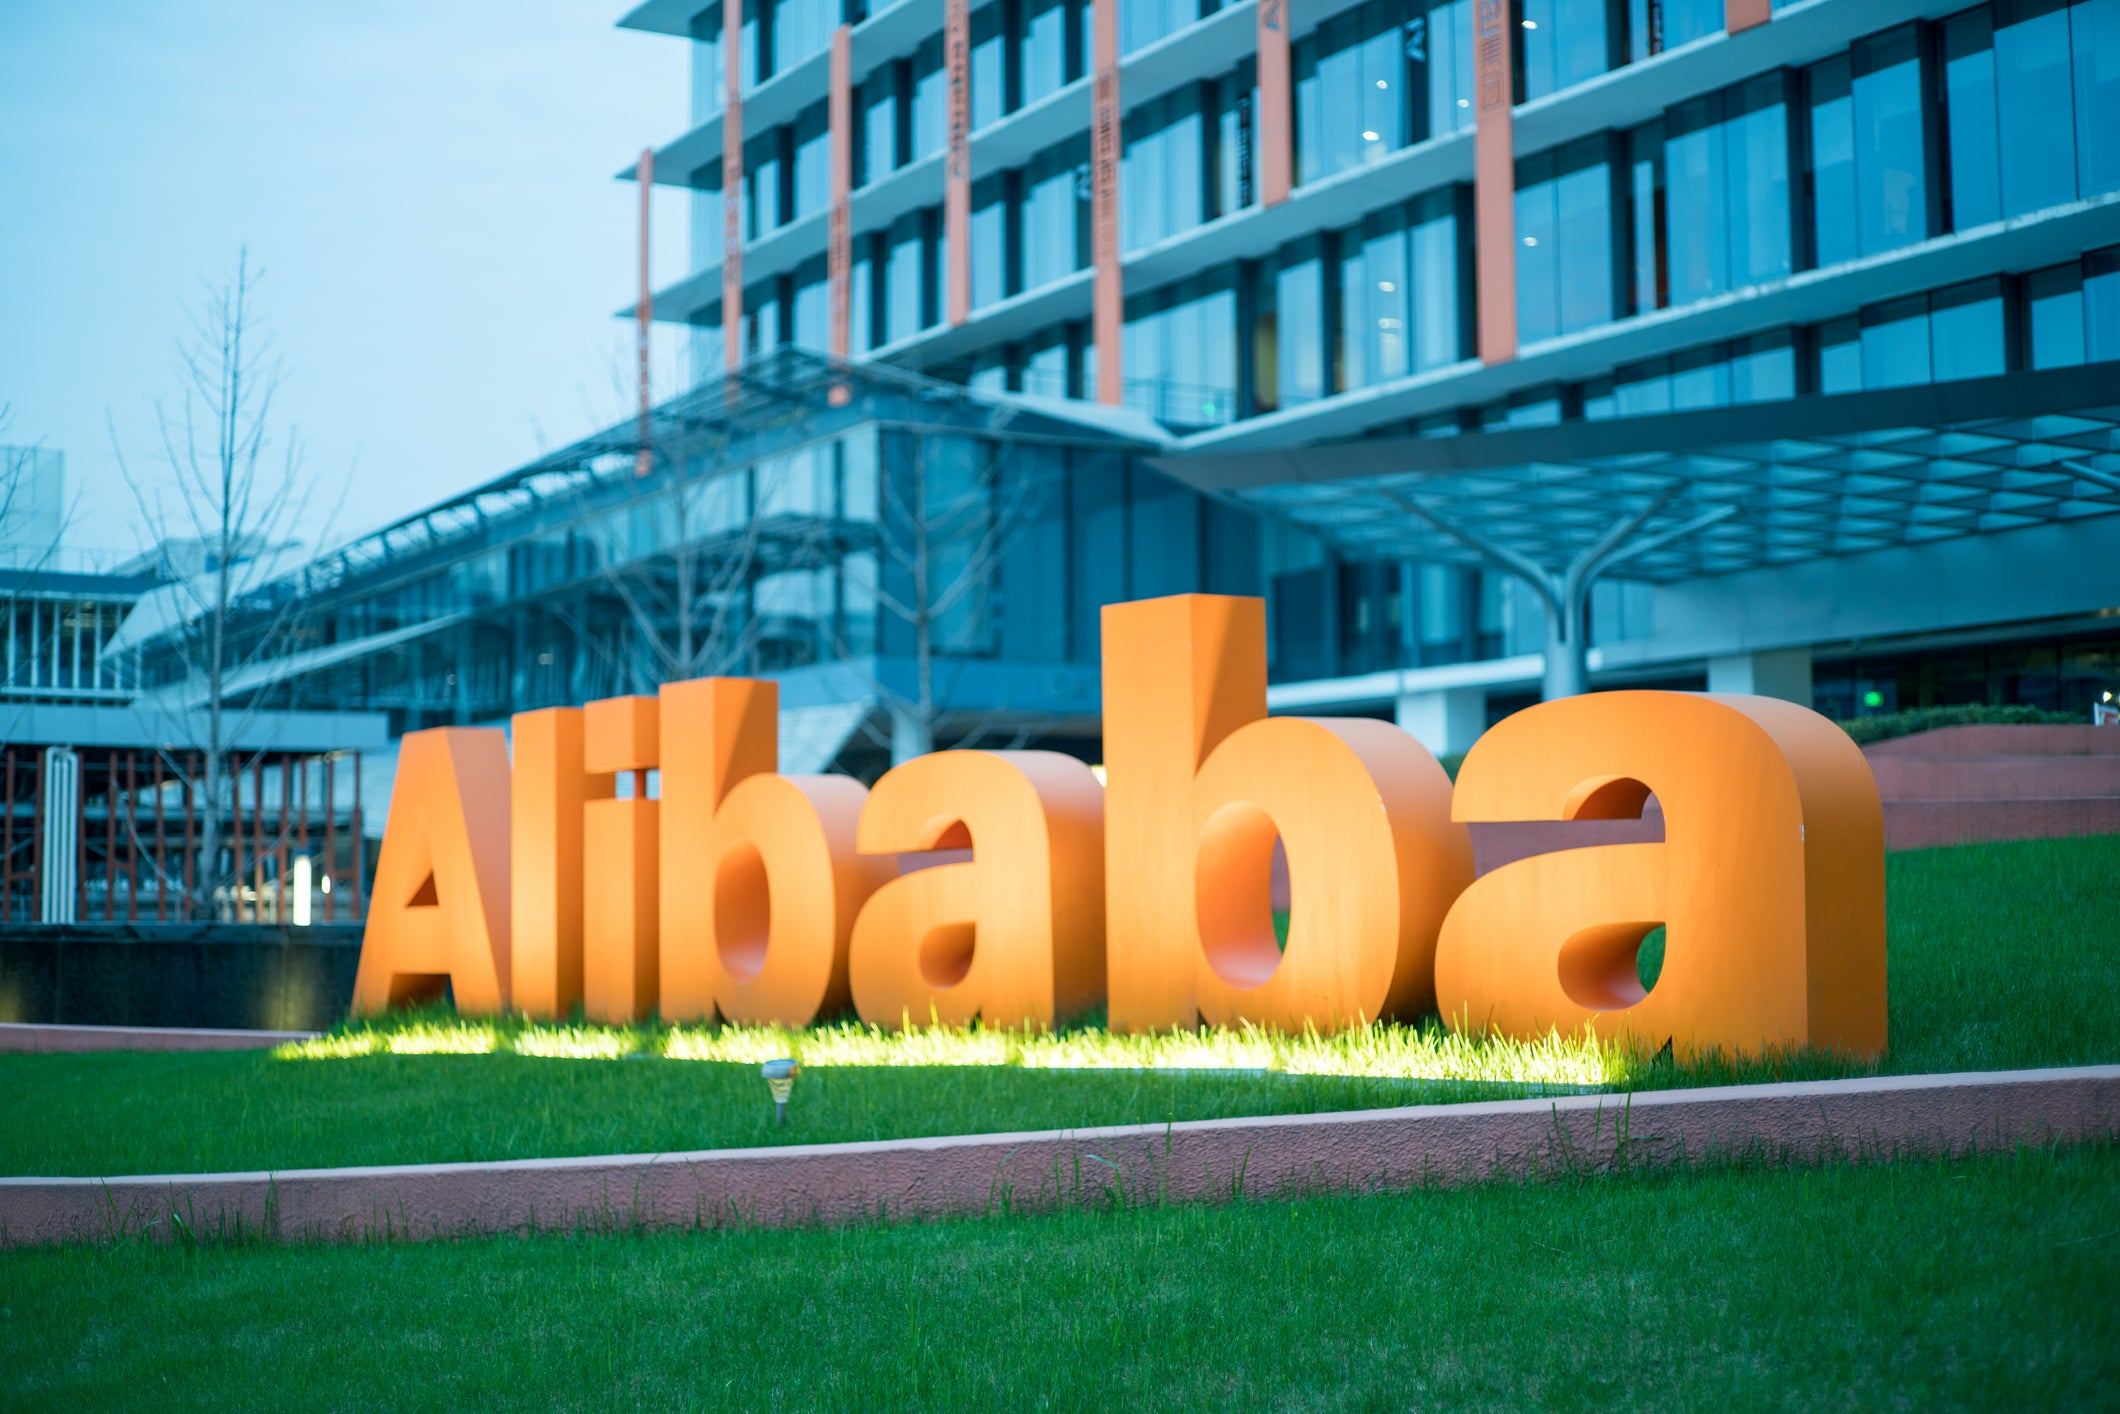 Alibaba 2.jpg